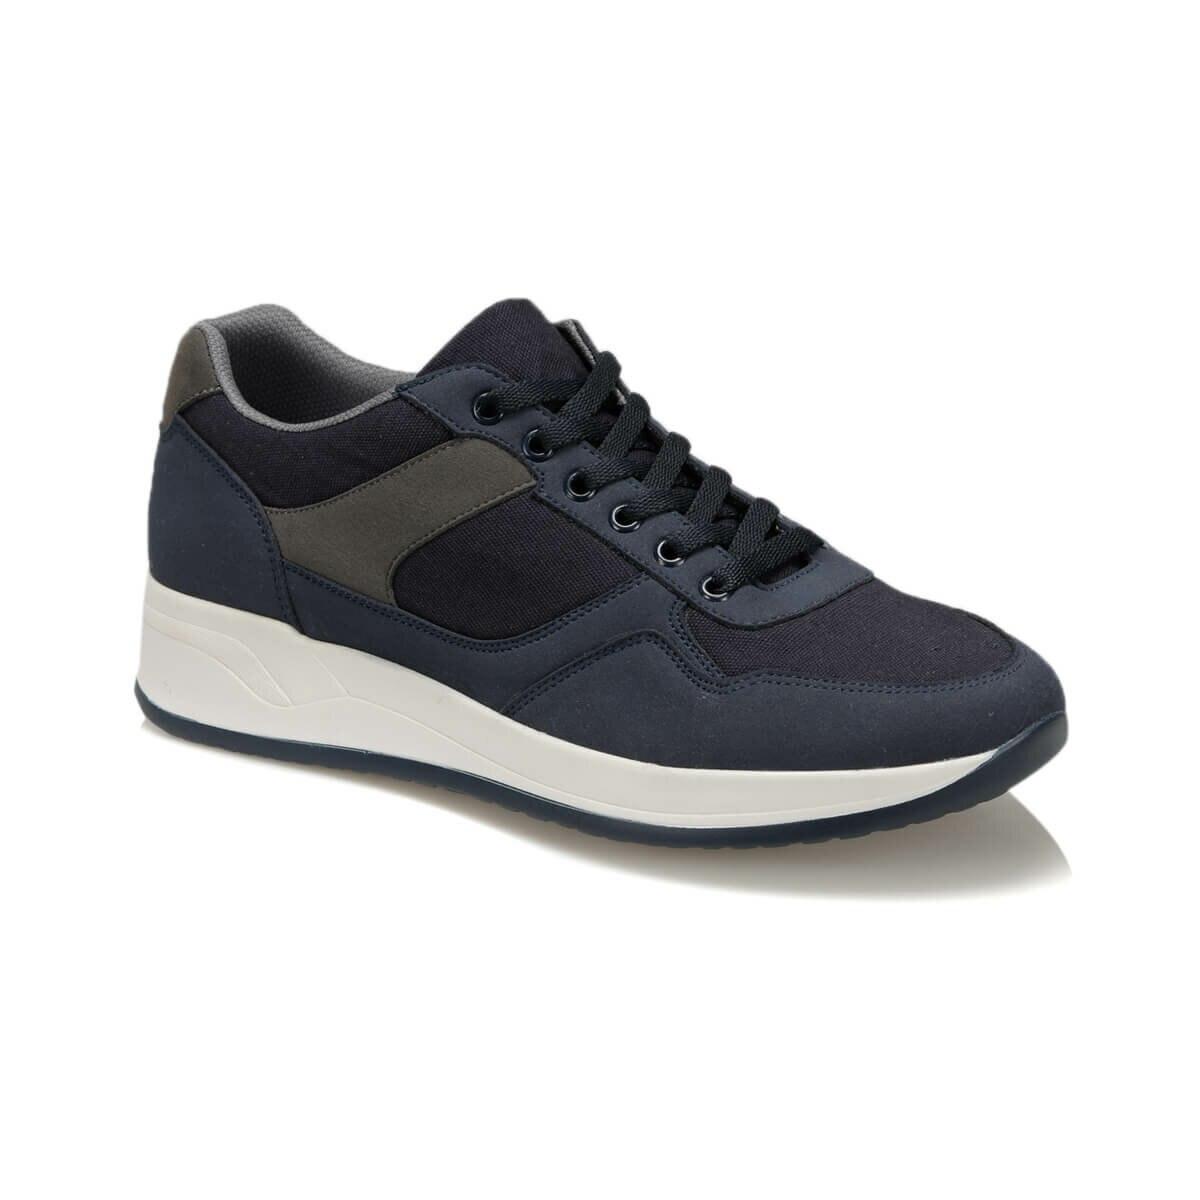 FLO LG191 Navy Blue Men 'S Shoes Forester